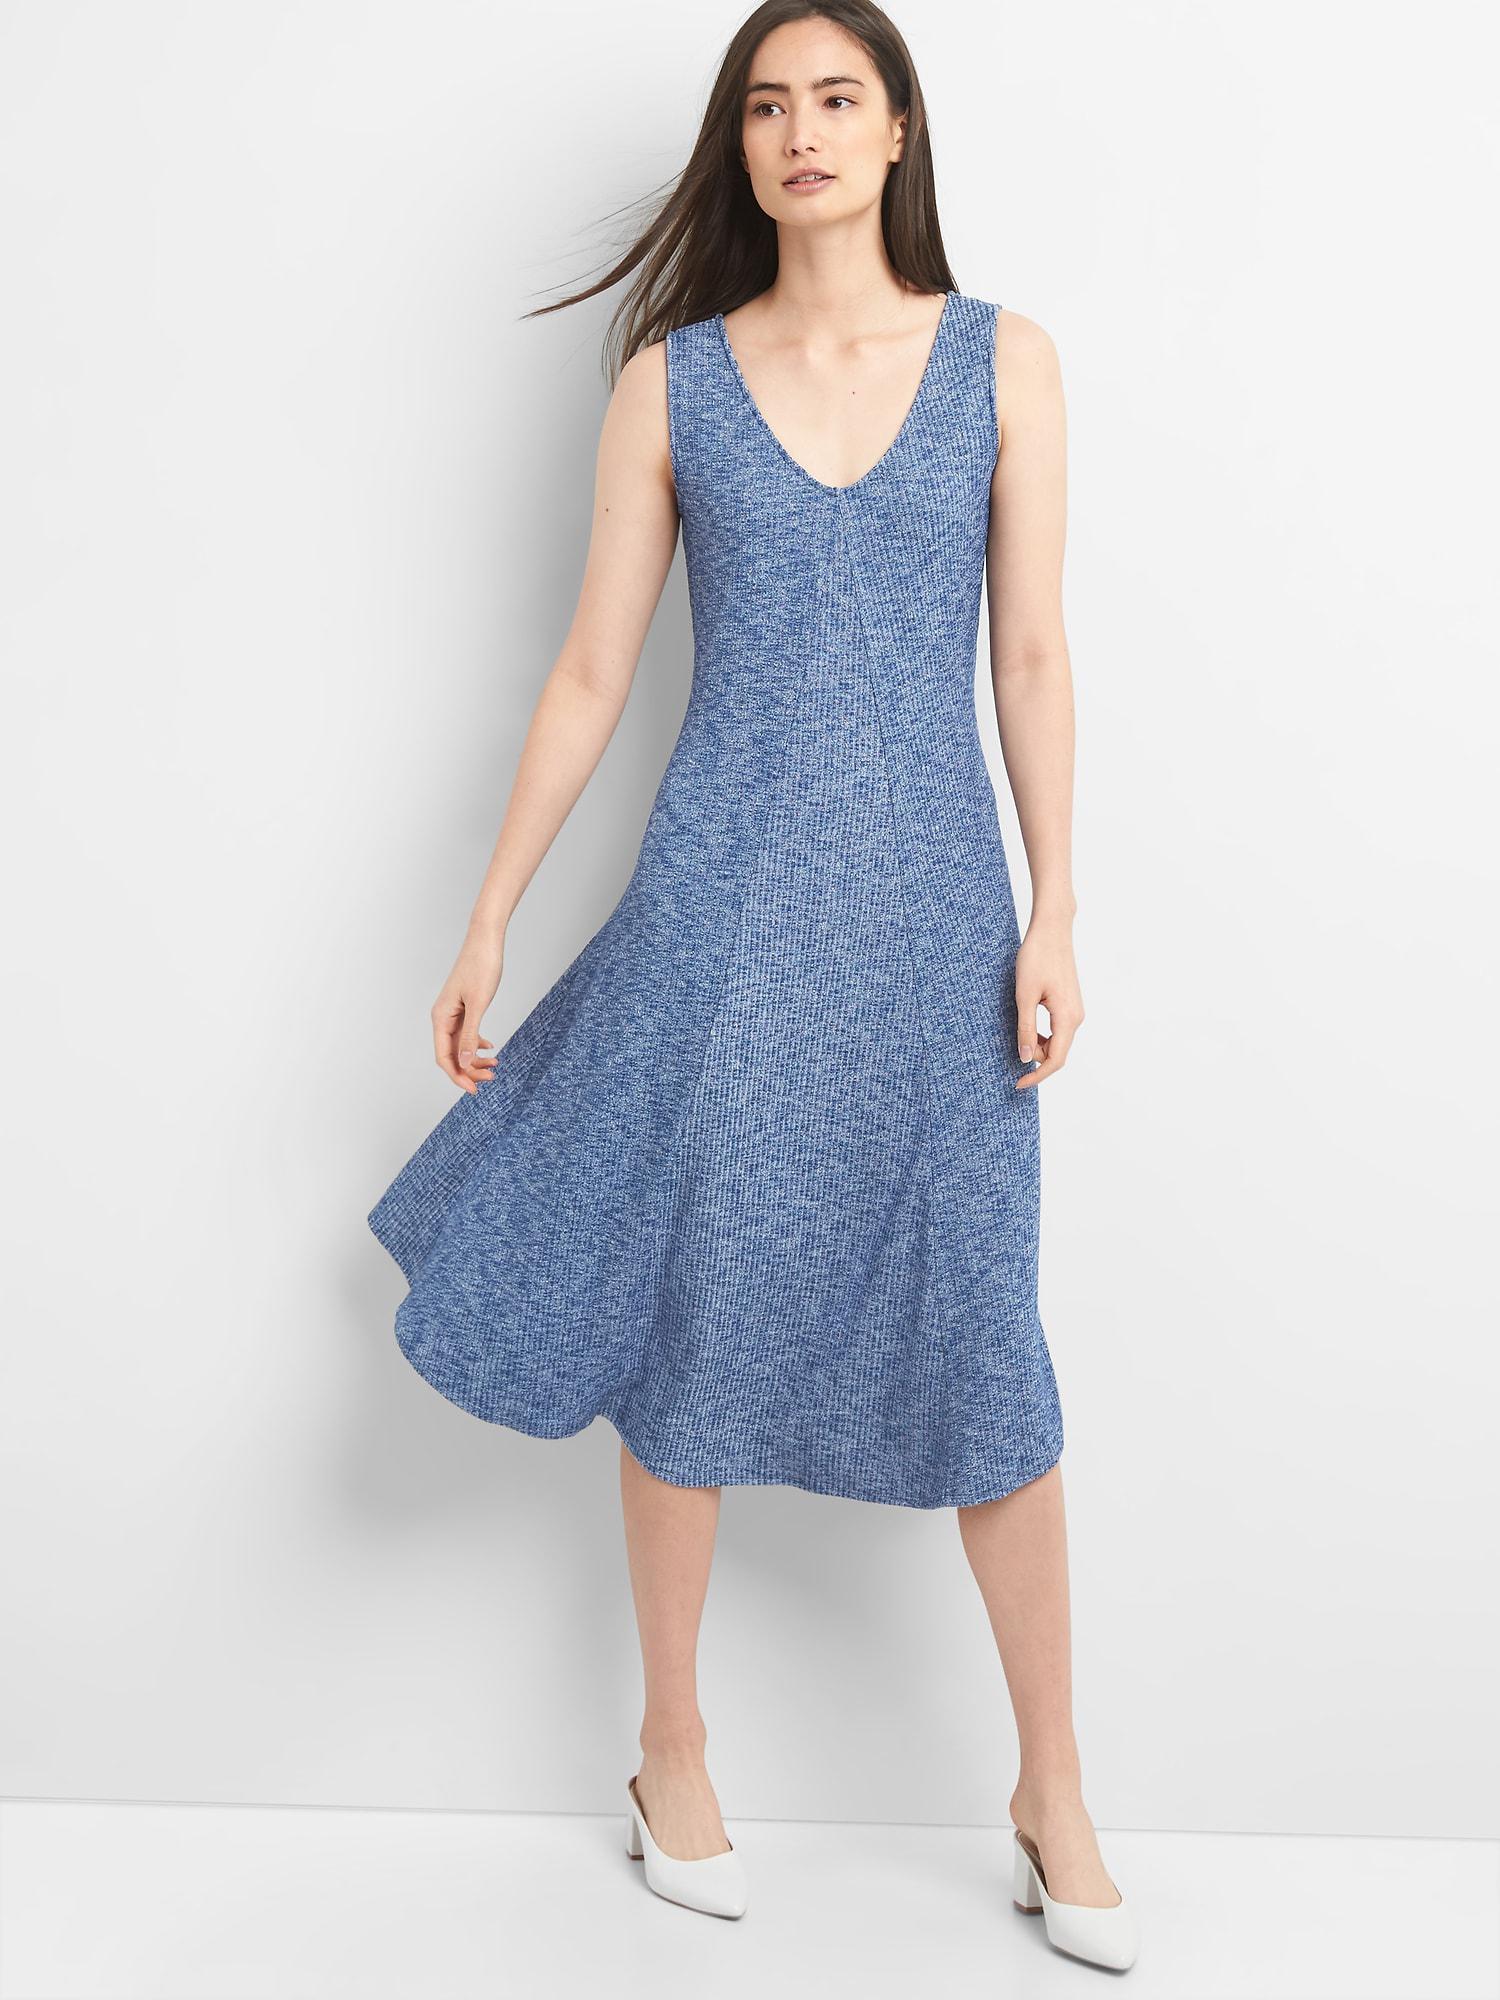 4558b9a521c Lyst - Gap Ribbed Softspun Sleeveless Midi Dress in Blue